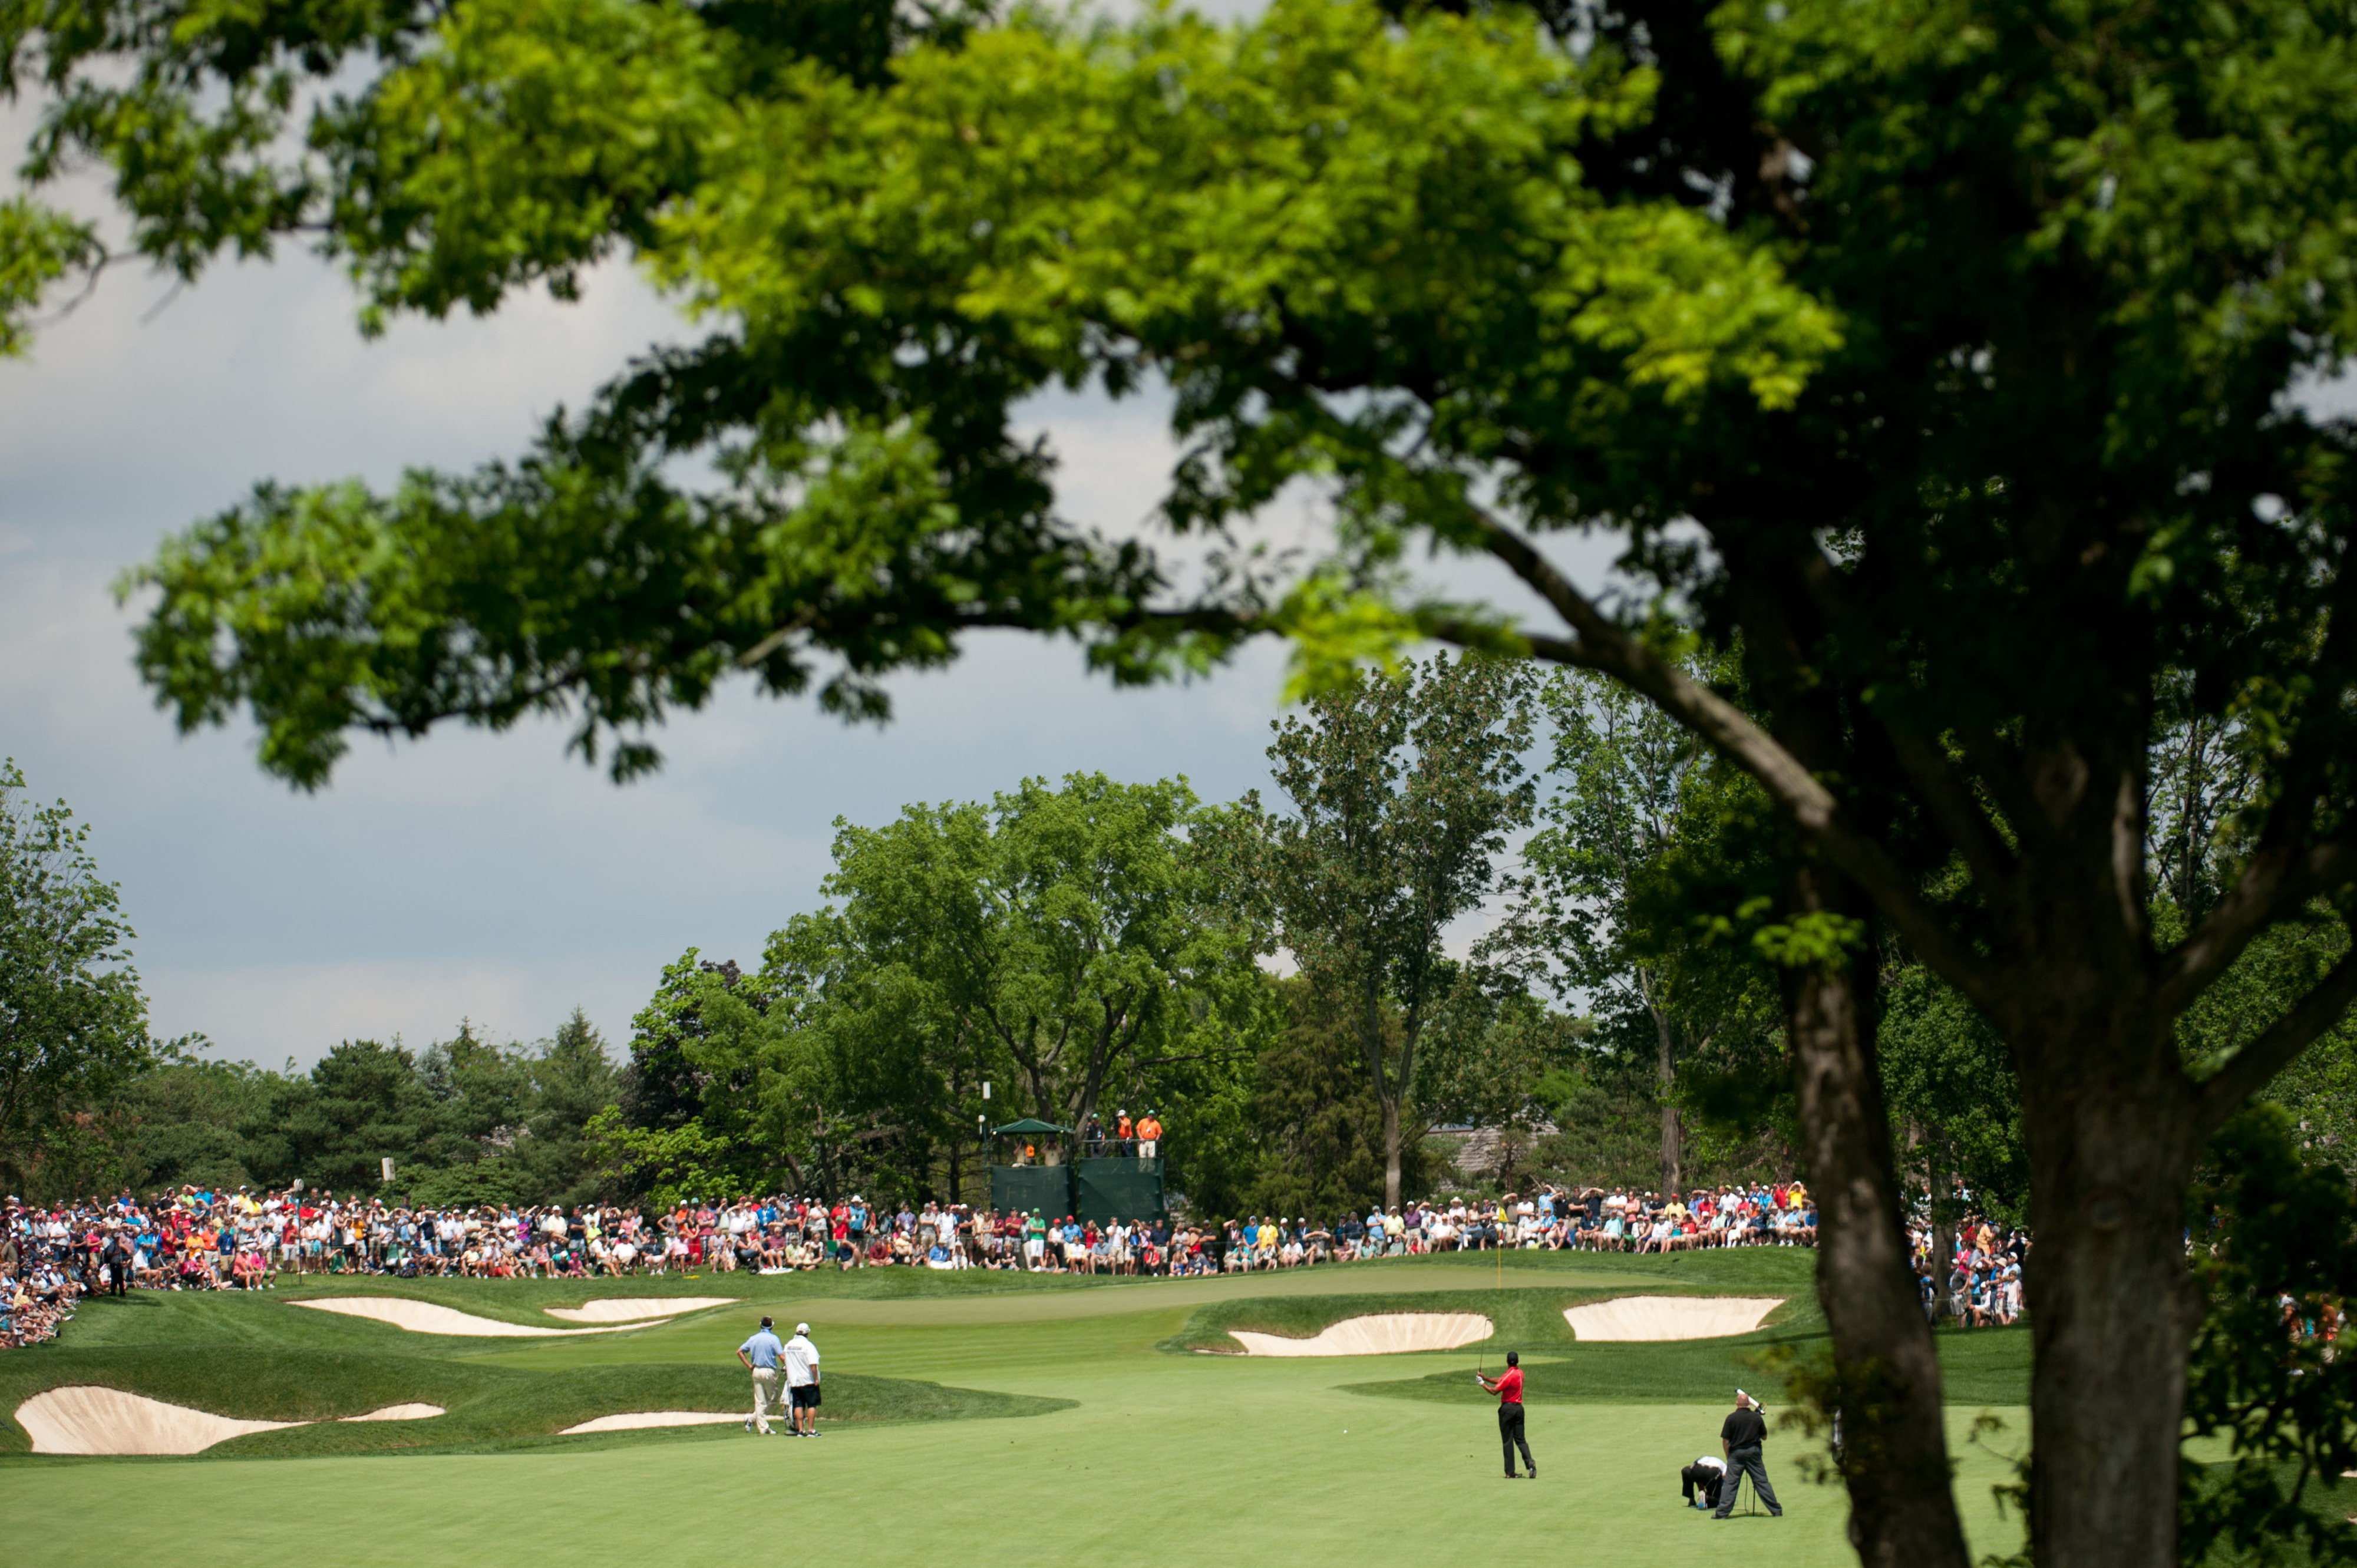 Memorial Tournament 2013 purse: Winner receives $1.12 million